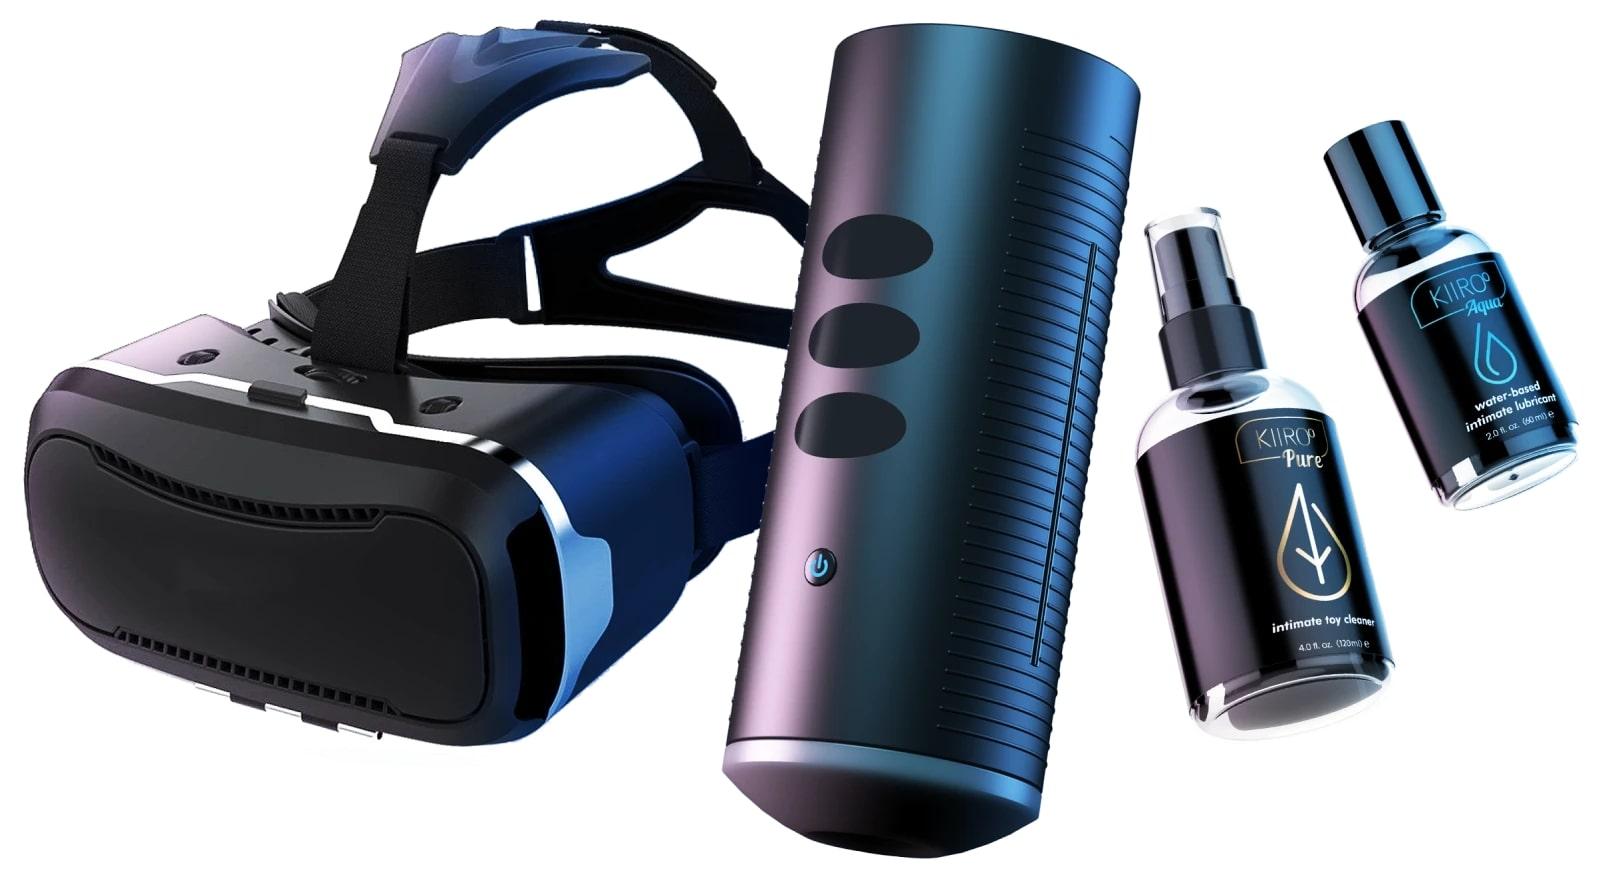 Kiiroo Titan VR Experience